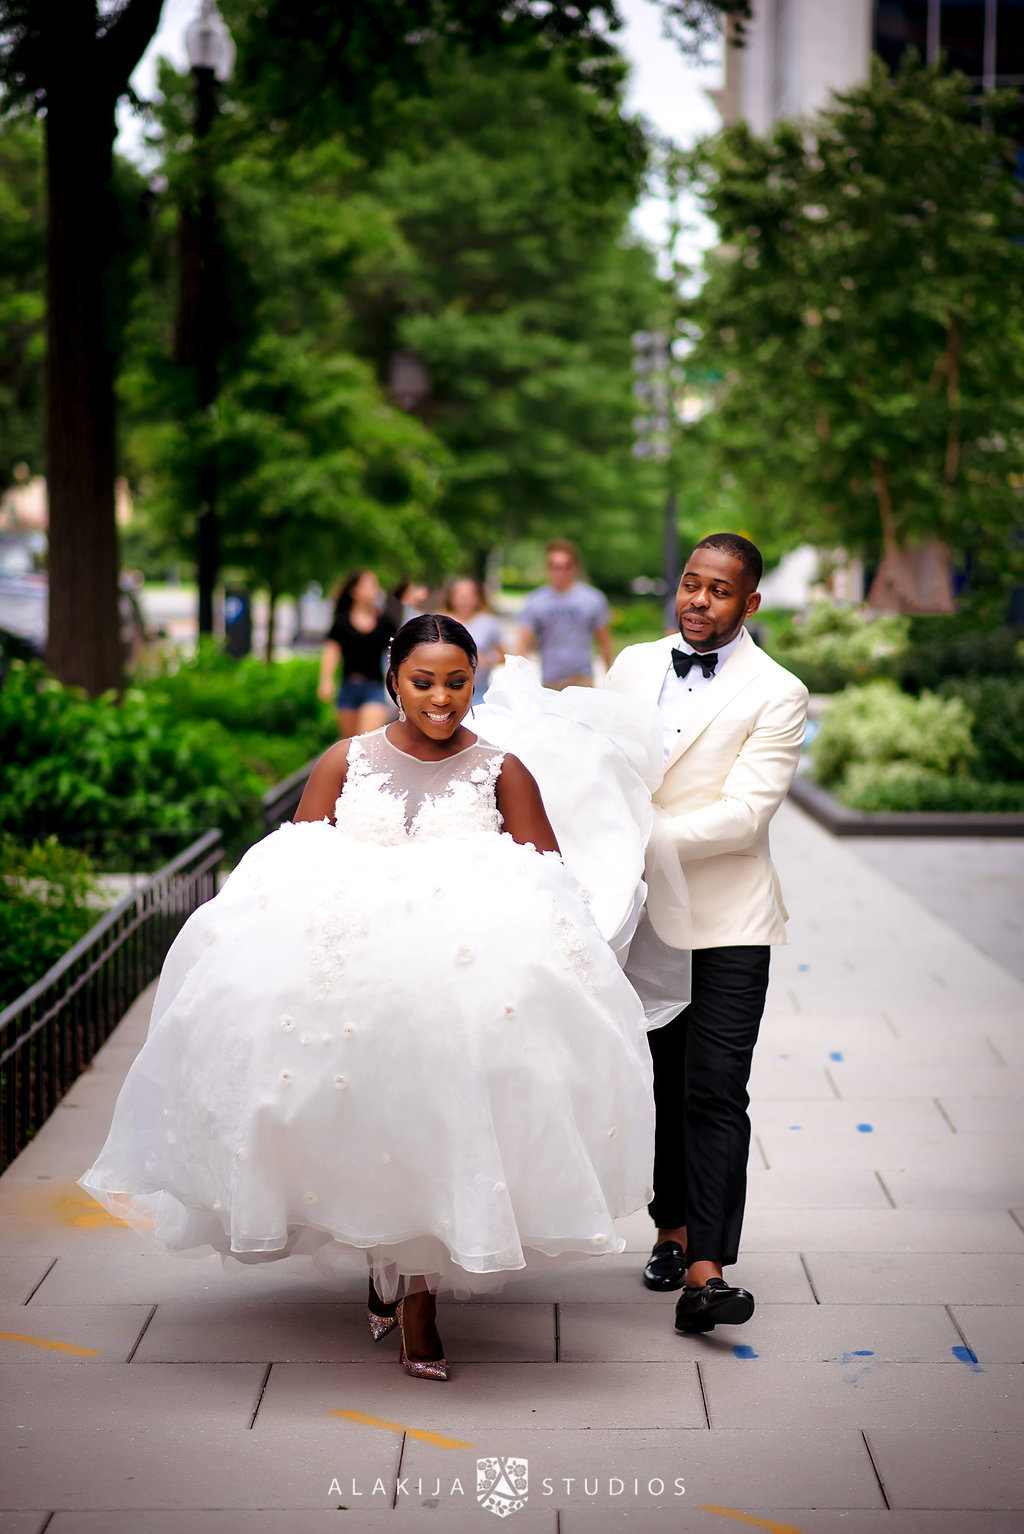 2018-08-18-Wedding-JideAlakija-WashingtonDC-ElliottandKudira-00601.jpg